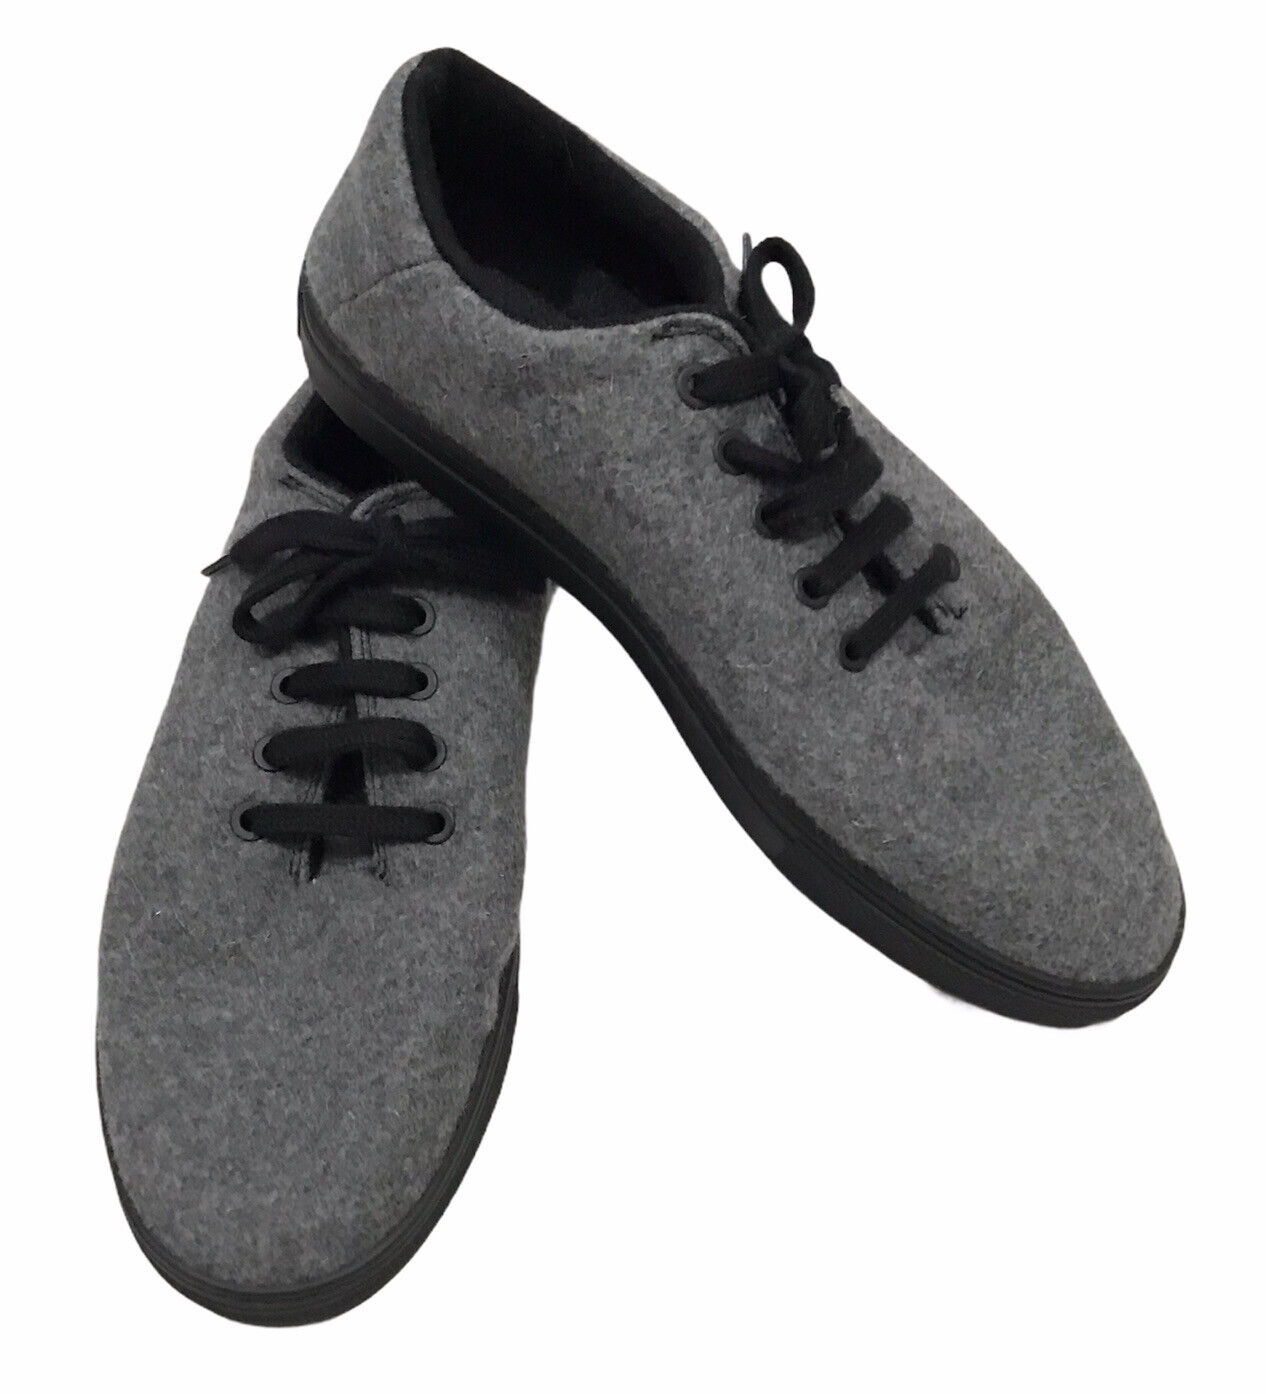 Baabuk Sneaker Light Grey Wool Black Sole Laces EU 41 Men 8 Women 10 EUC